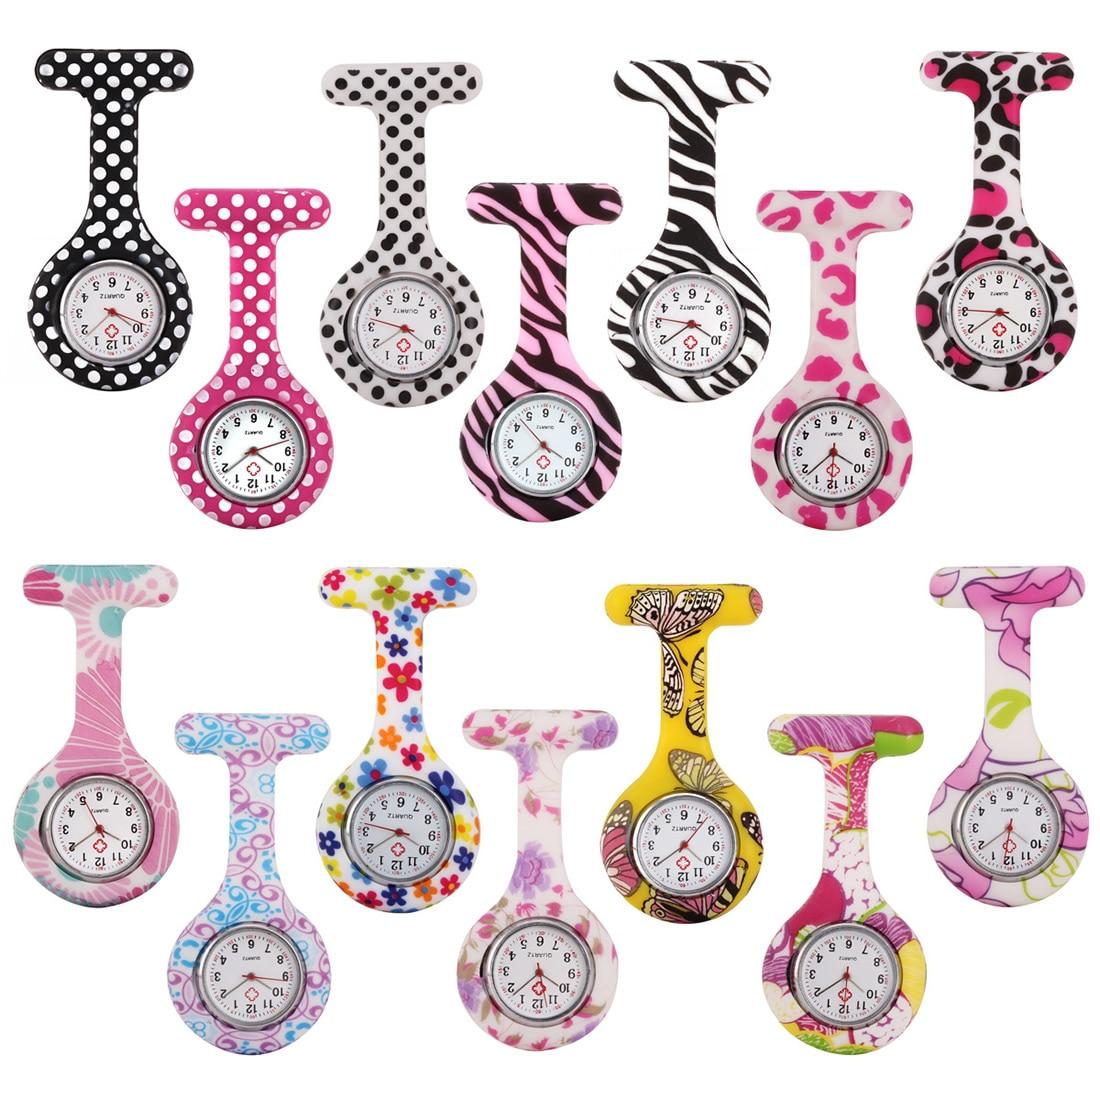 Pocket Watch Clip-on Fob Quartz Brooch Hanging Rubber Silicone Nurse Watch Fashion Casual Men Women Unisex relogio feminino saat